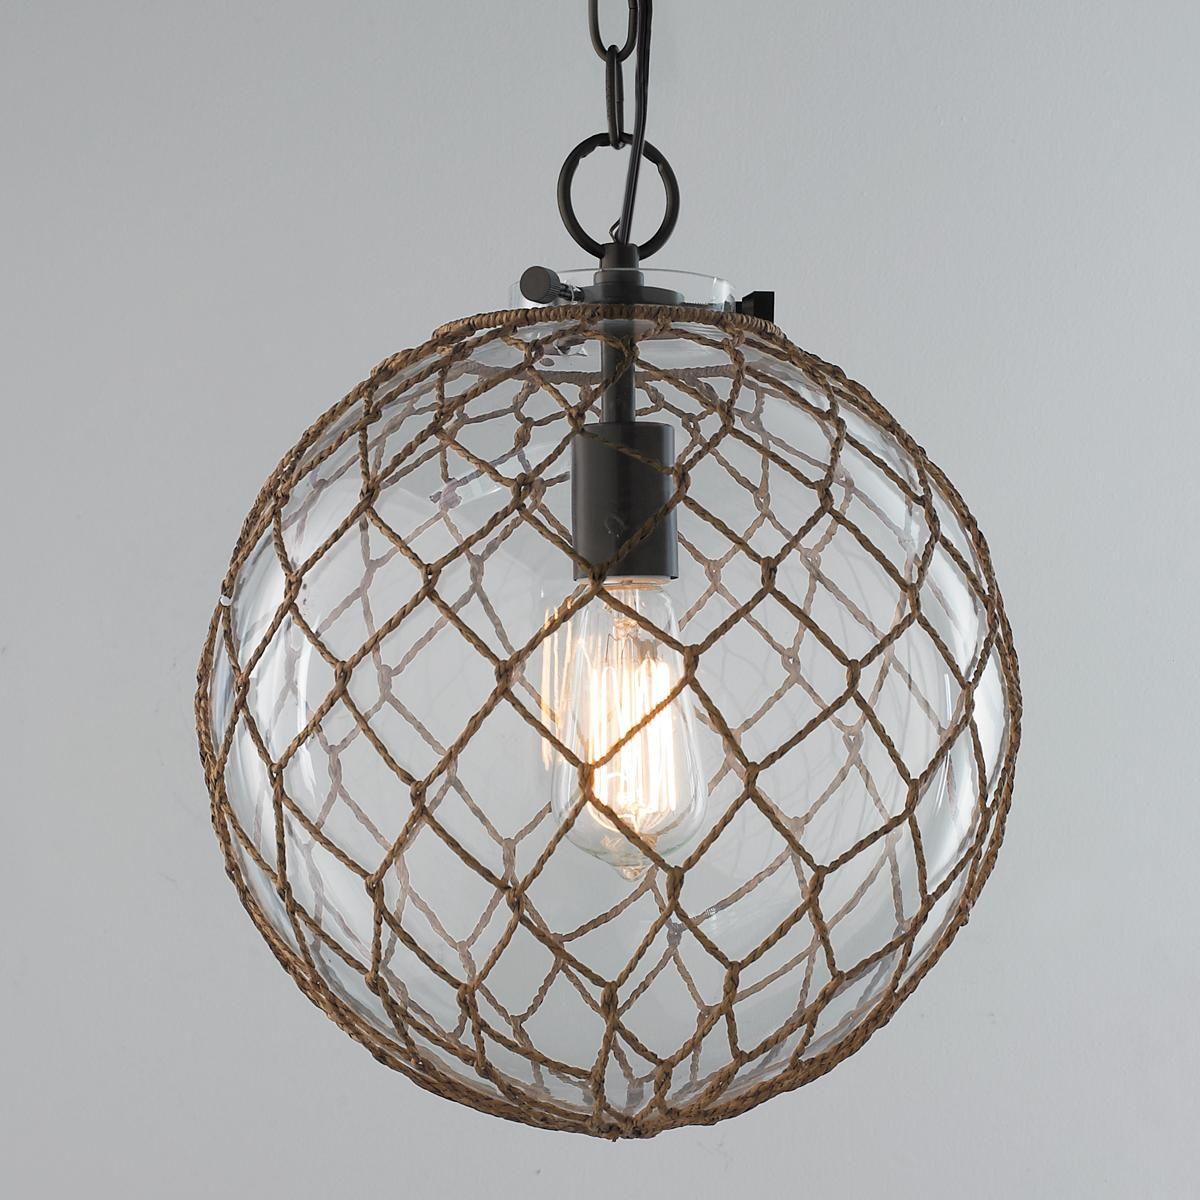 Jute Rope Globe Pendant | Coastal And Nautical Looks For Prange 1 Light Single Globe Pendants (View 22 of 30)